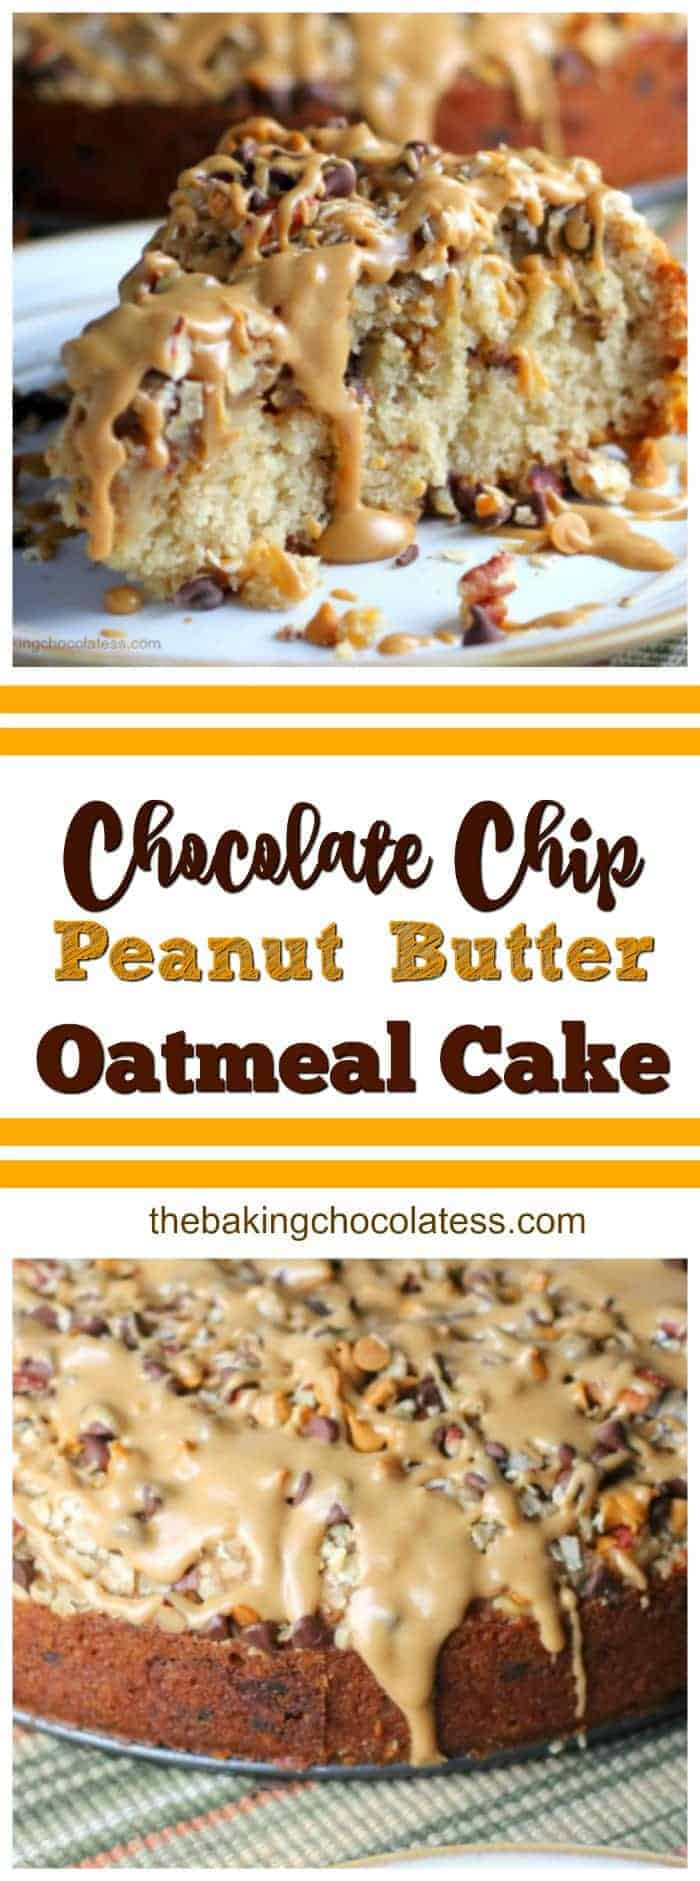 Chocolate Chip & Peanut Butter Oatmeal Cake